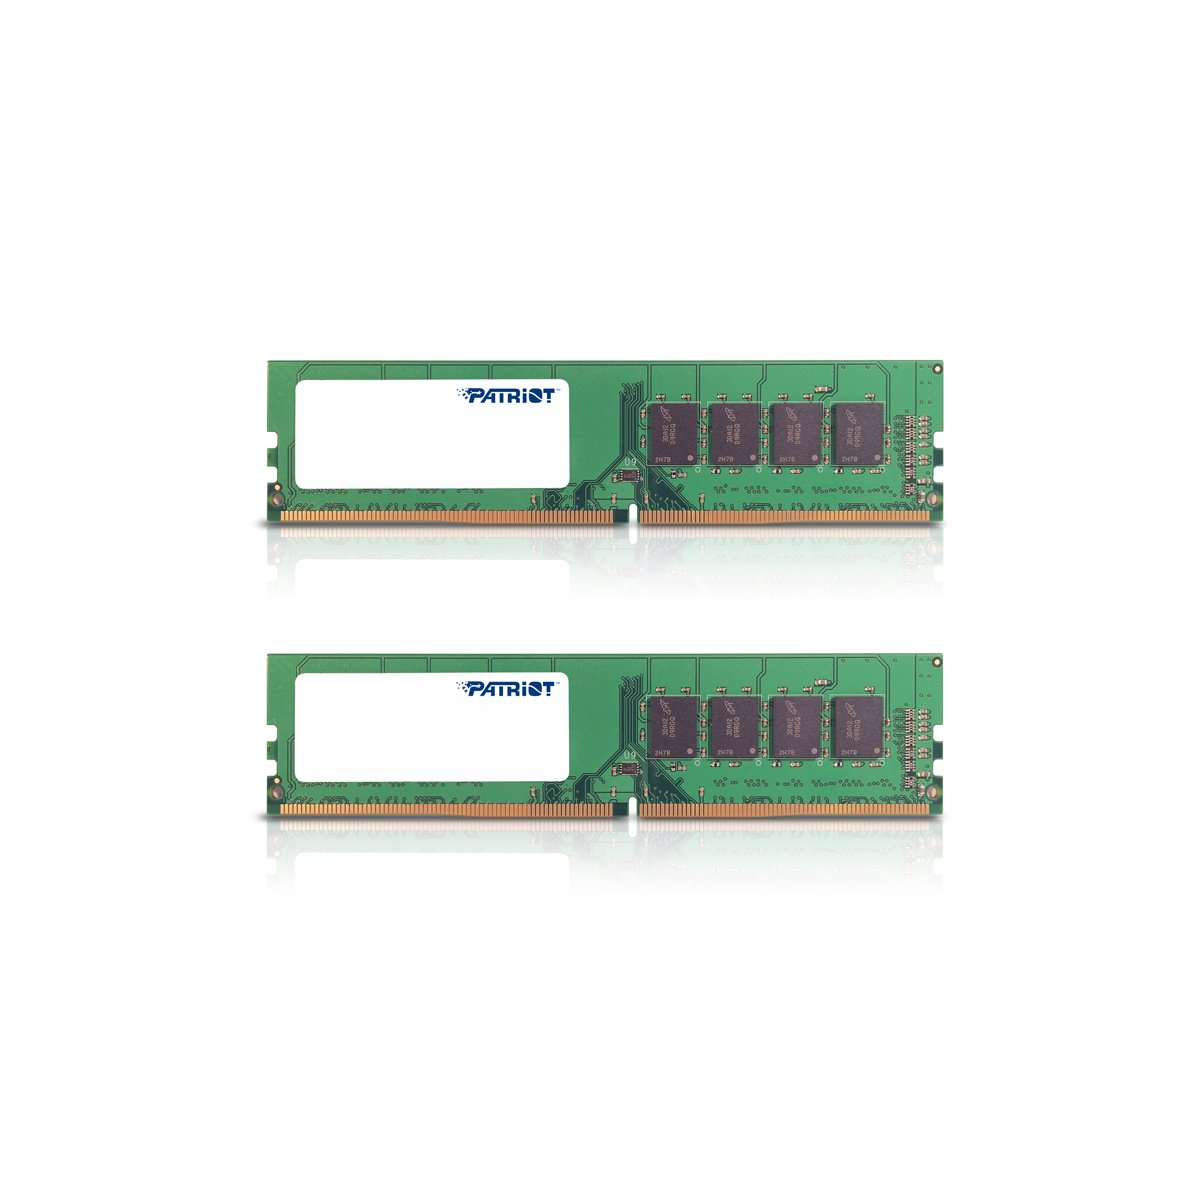 Patriot Memory 32gb Signature Ddr4 Sdram Memory Module - 32 Gb - Ddr4 Sdram - 2133 Mhz Ddr4-2133/pc4-17000 - Unbuffered - 288-pin - Dimm (psd432g2133k)